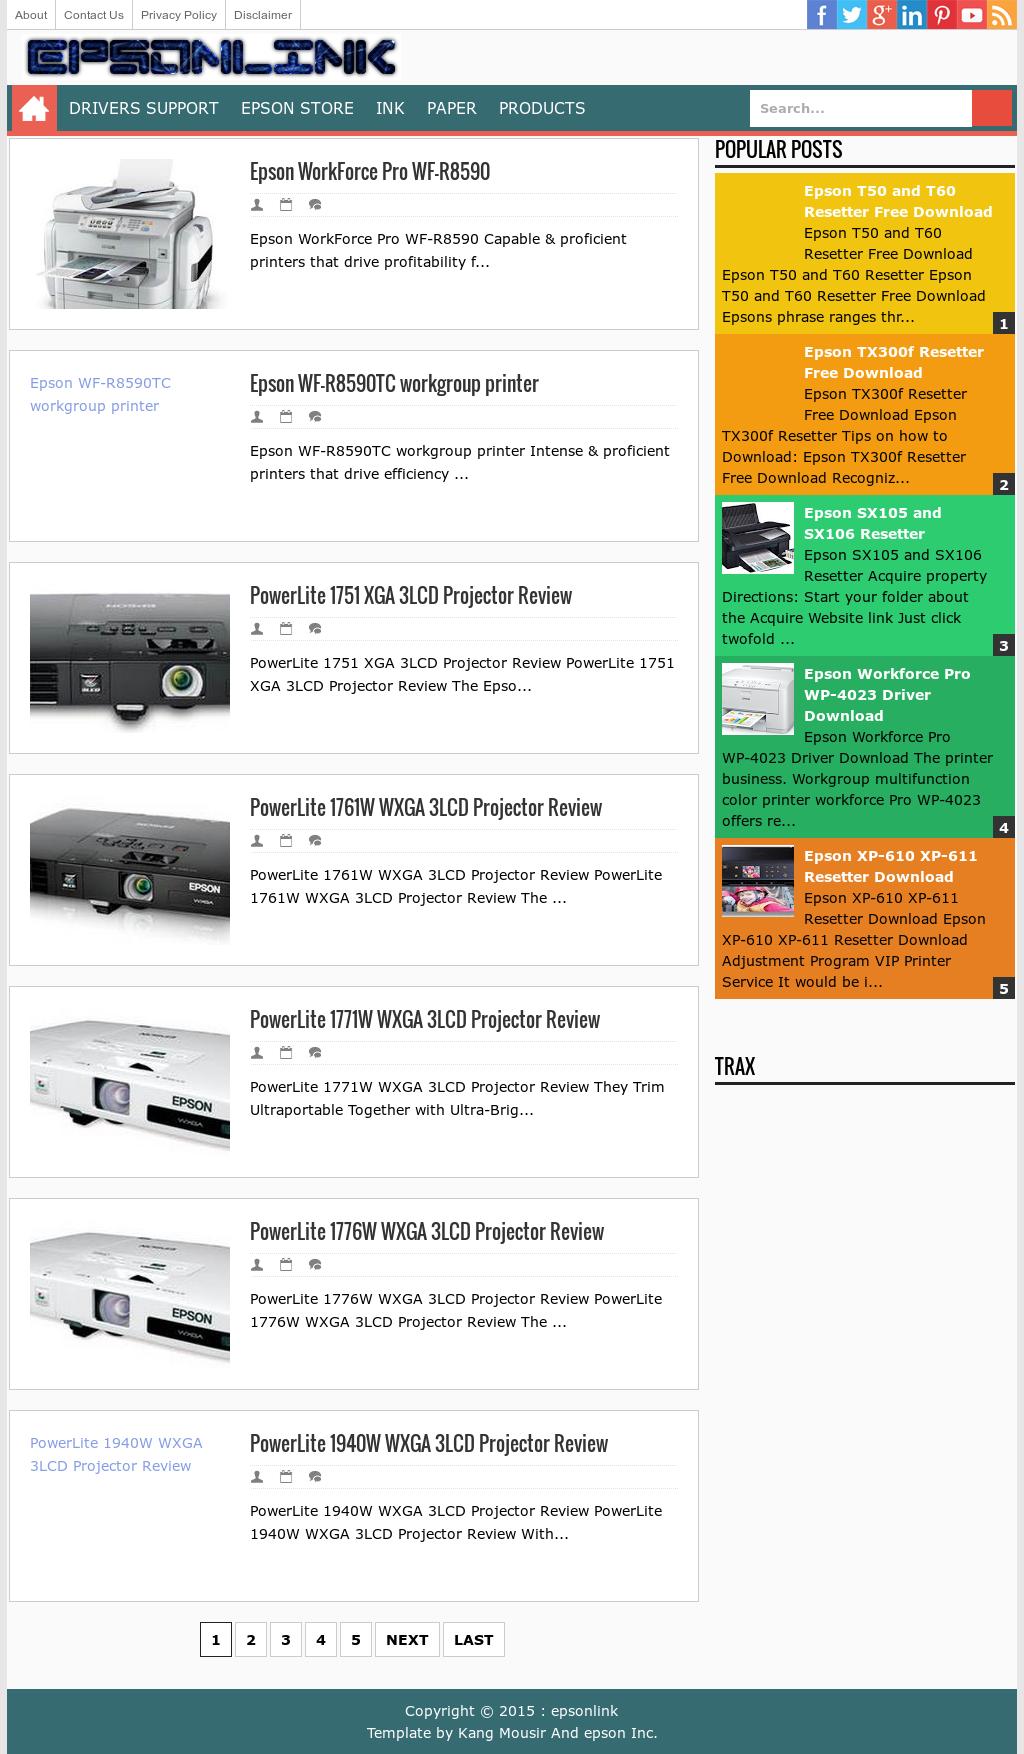 Owler Reports - Epsonlink Blog Epson L555 Resetter Download